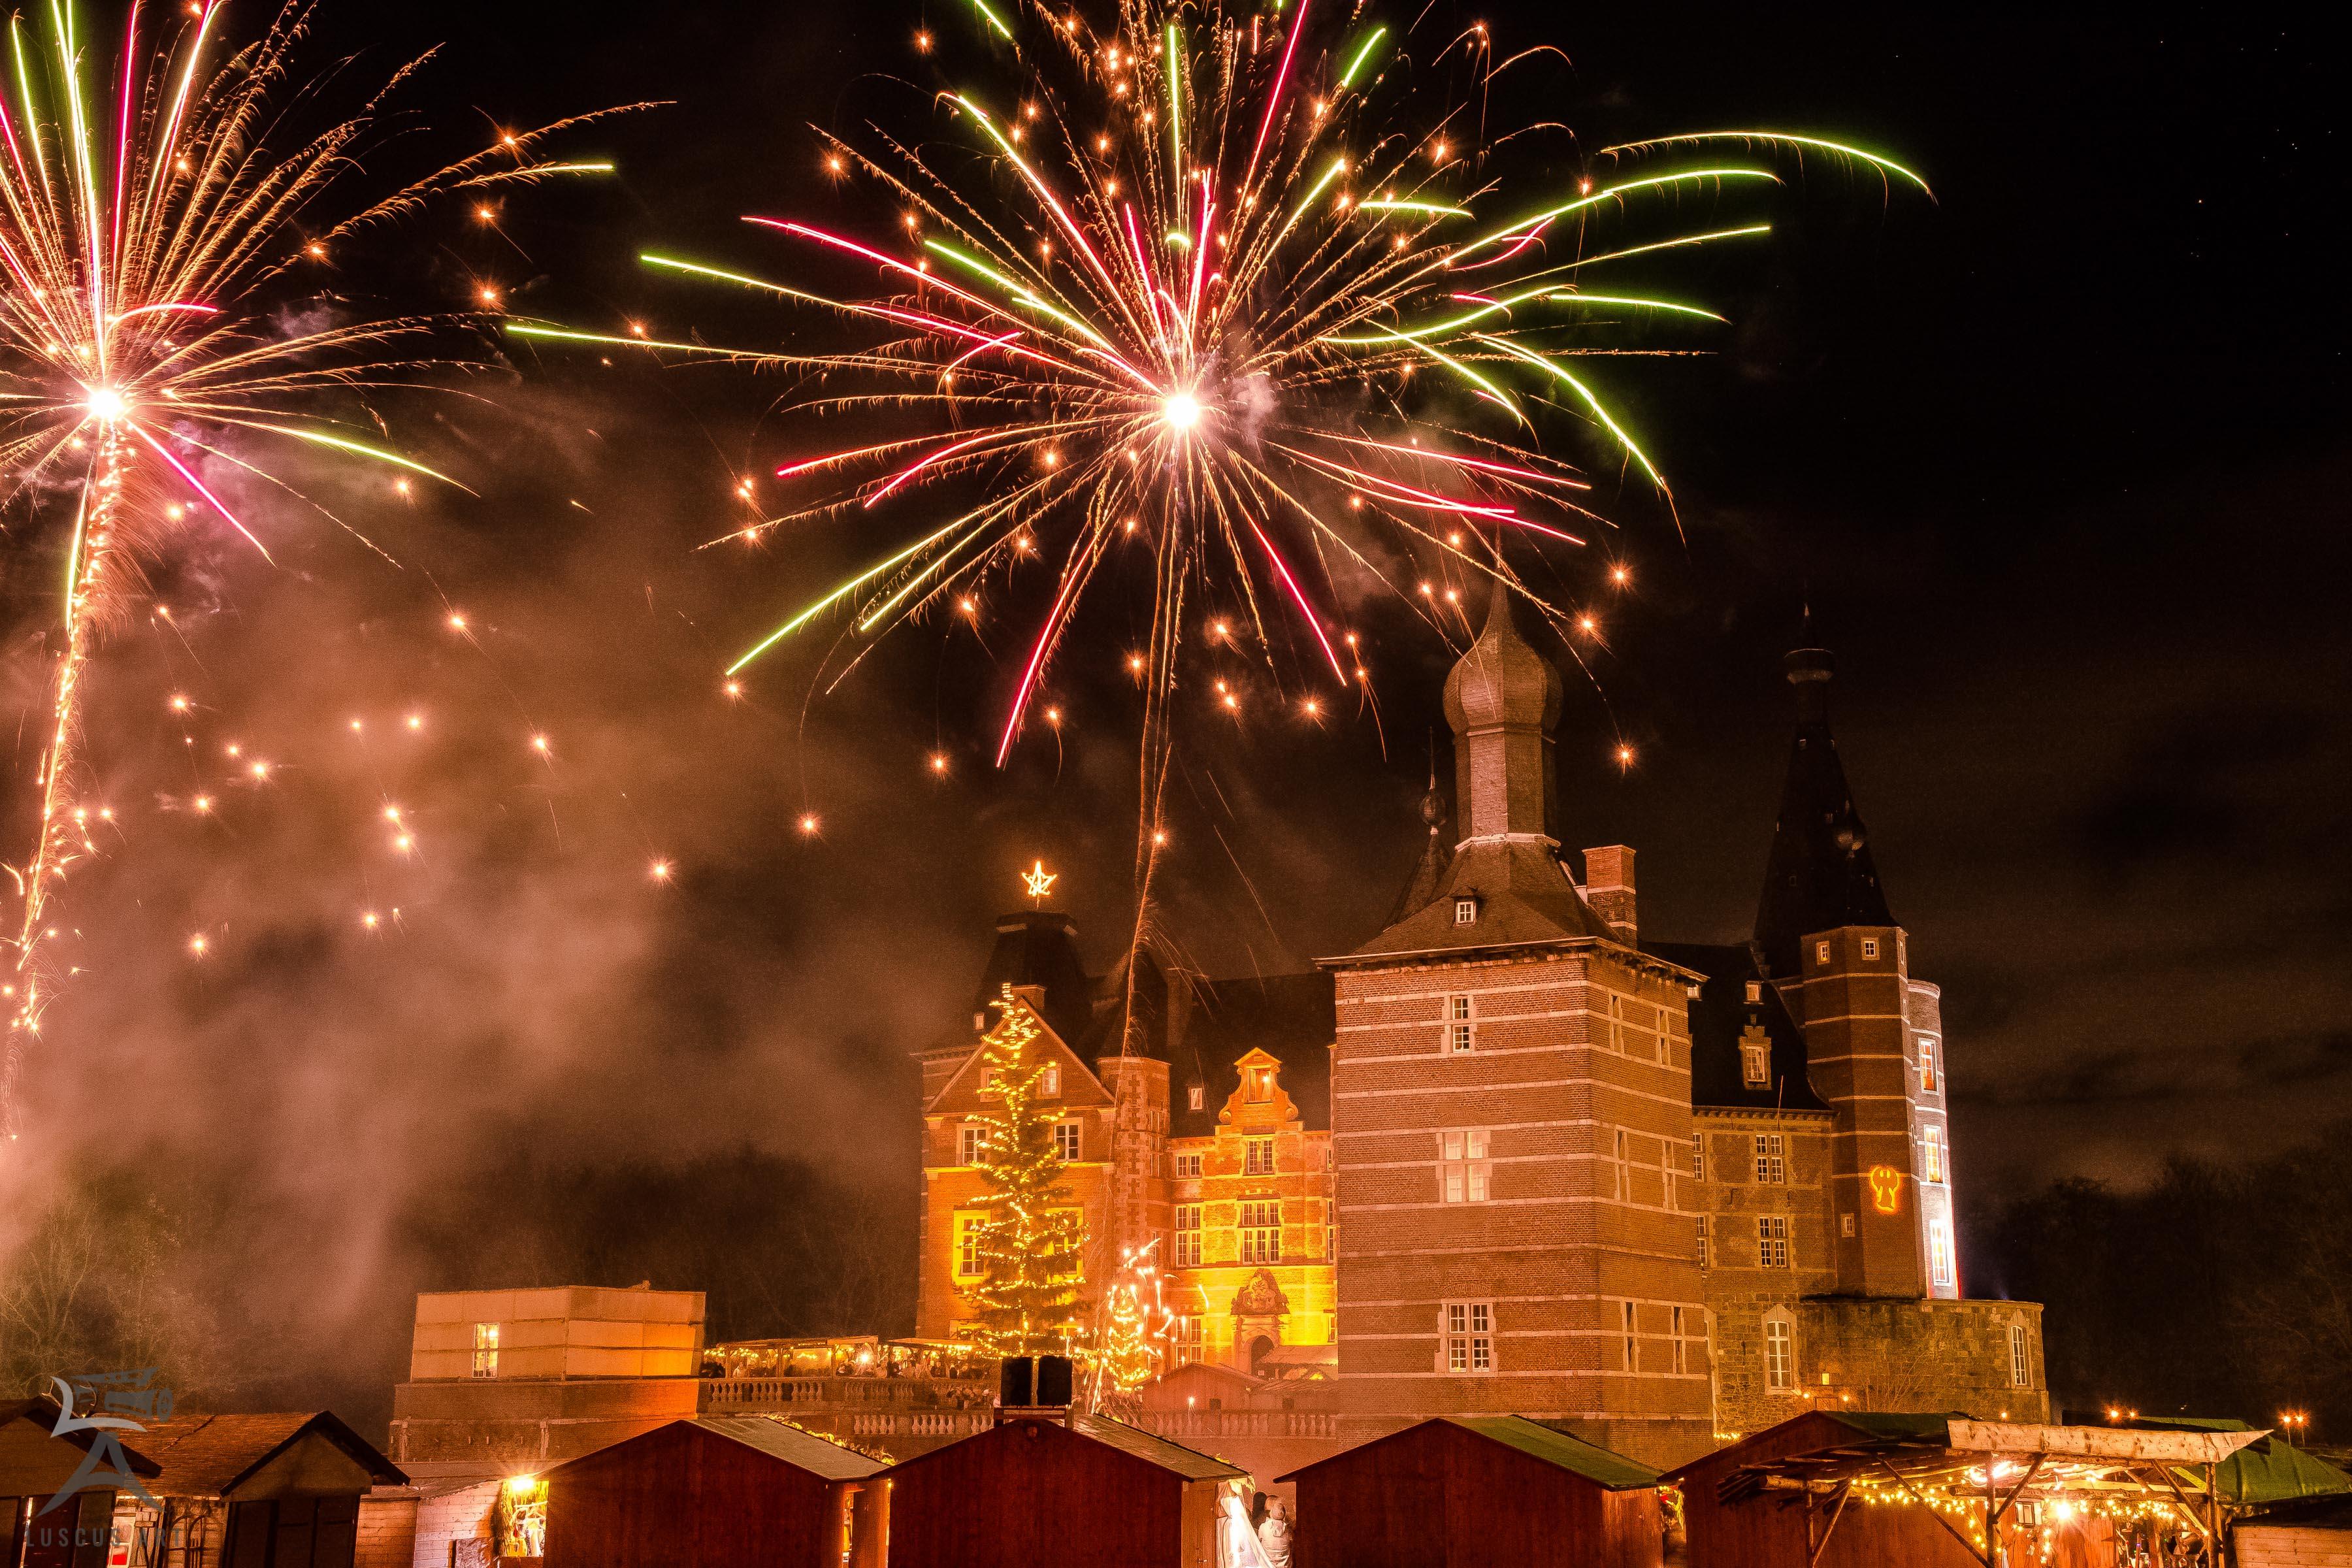 Weihnachtsmarkt Schloss Merode, Events